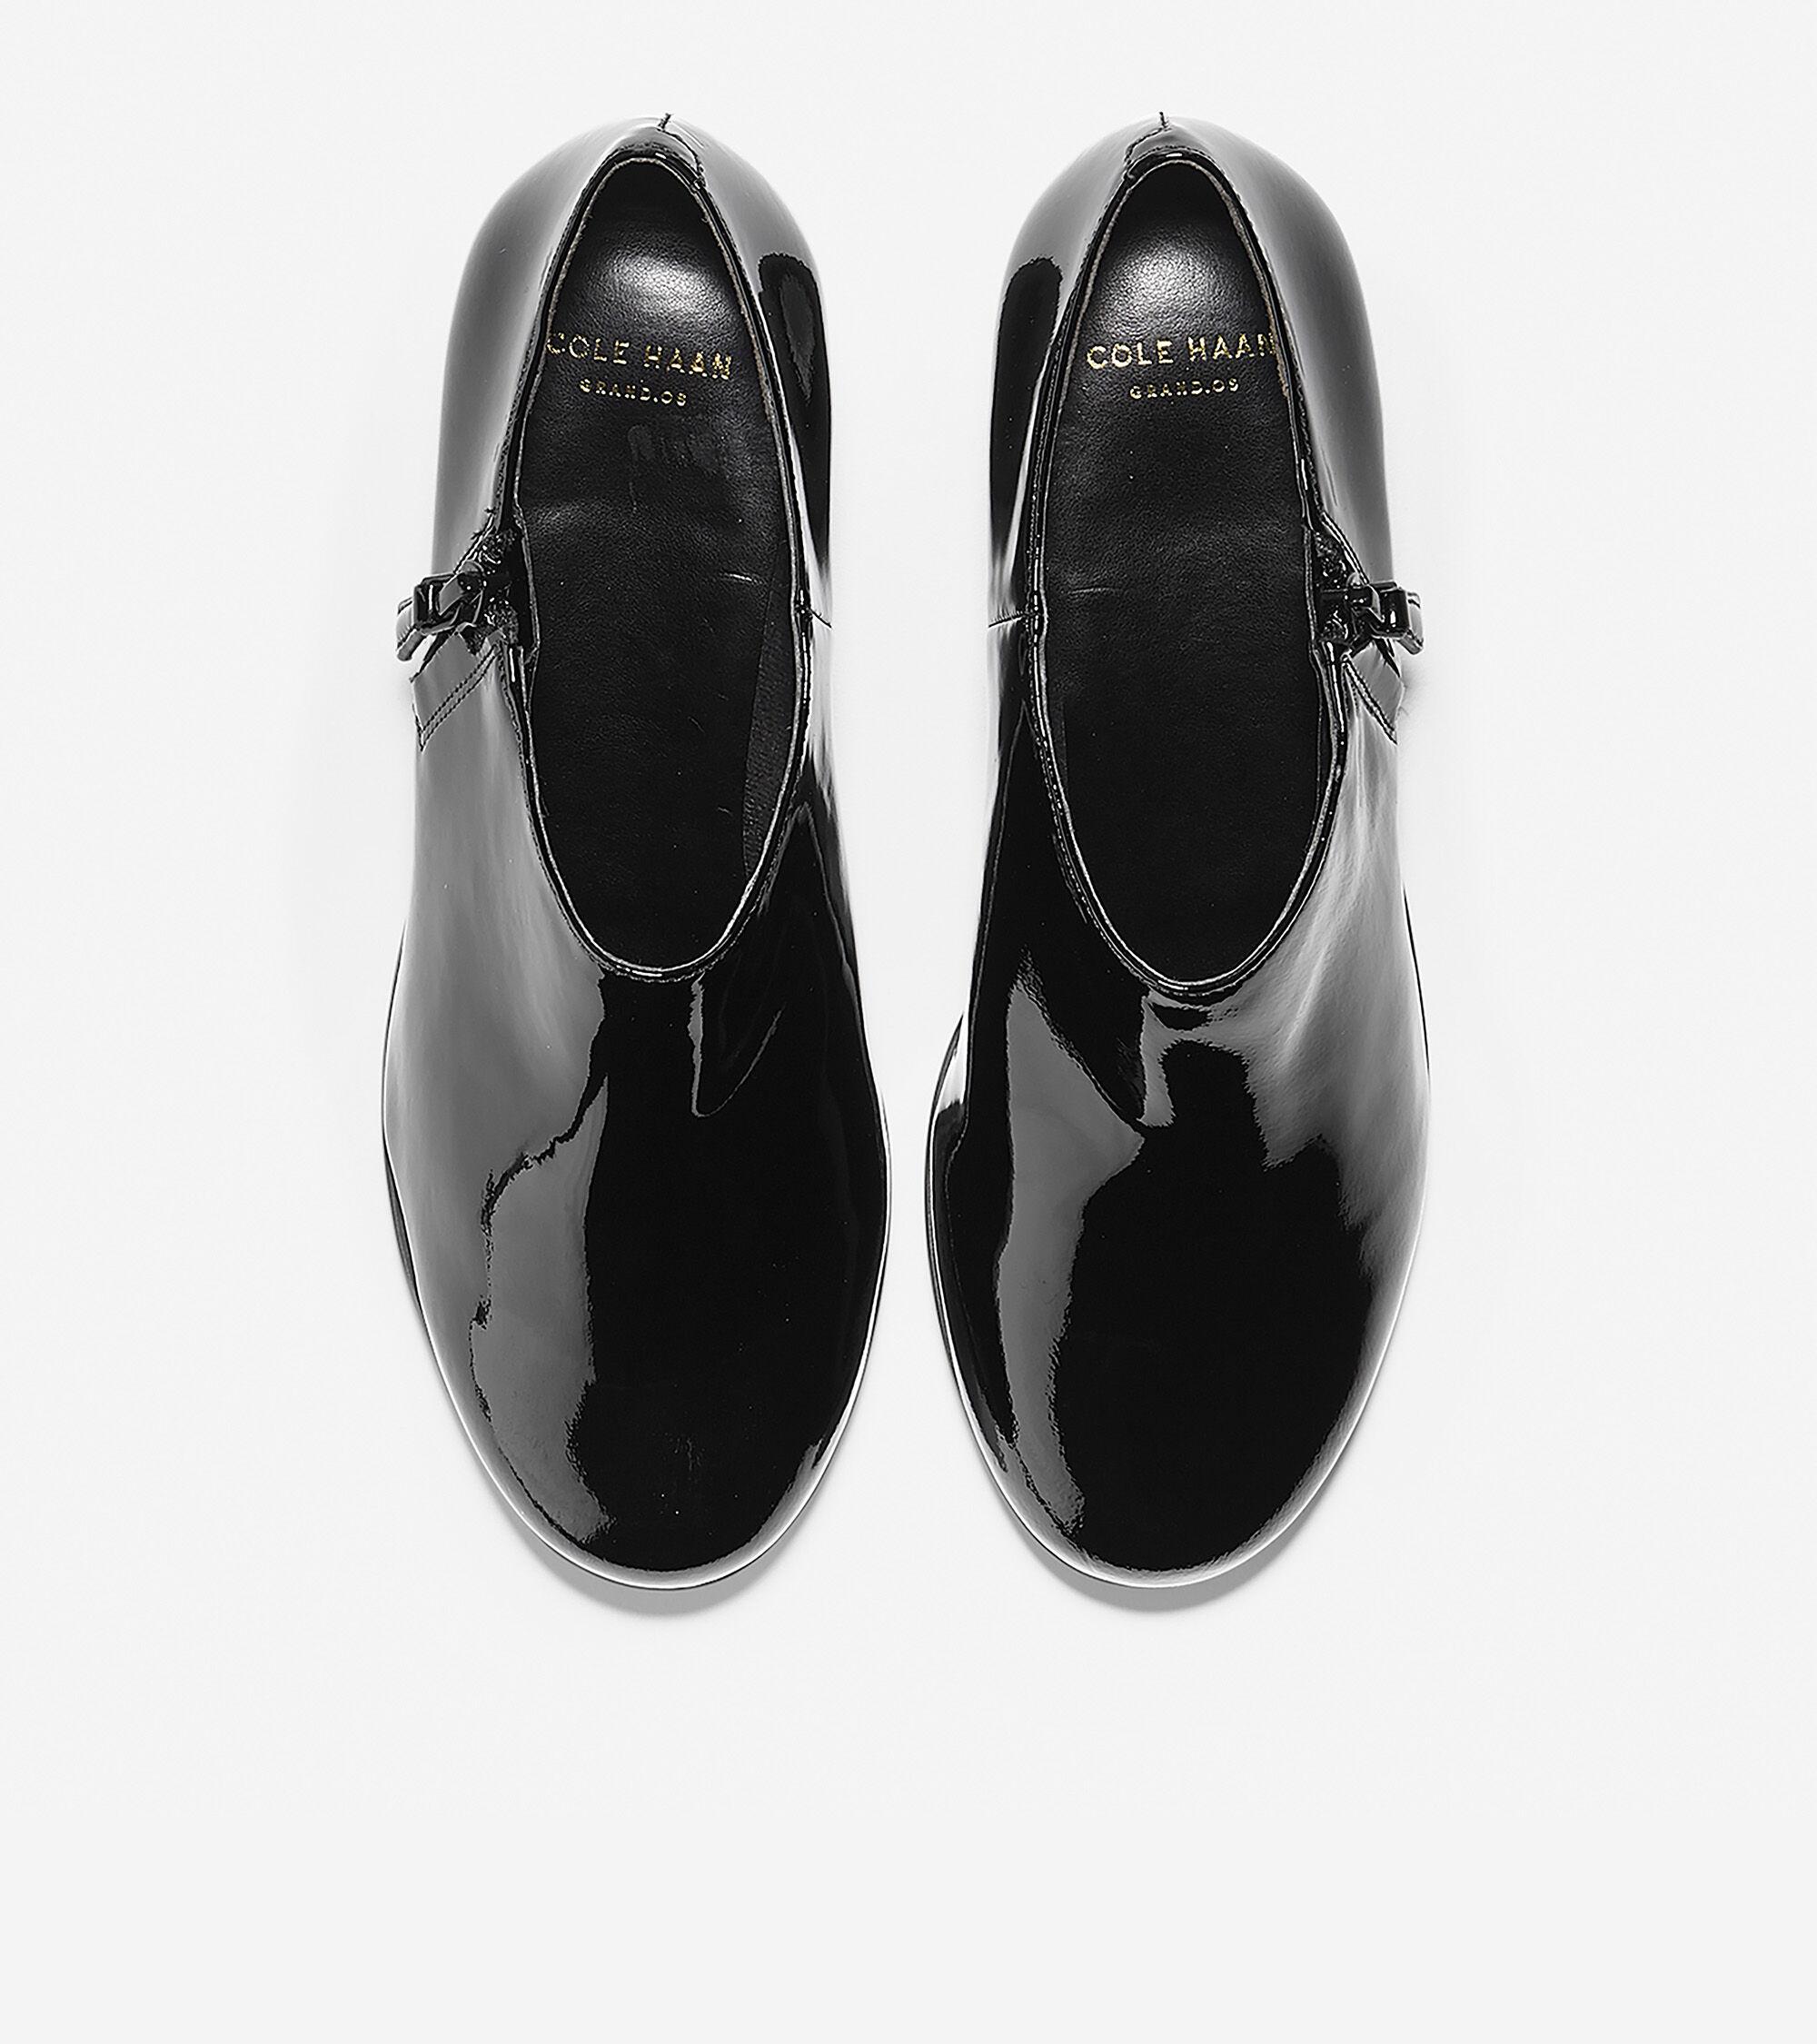 352b12991f3 Callie Rain Shoes (30mm) in Black Waterproof Patent